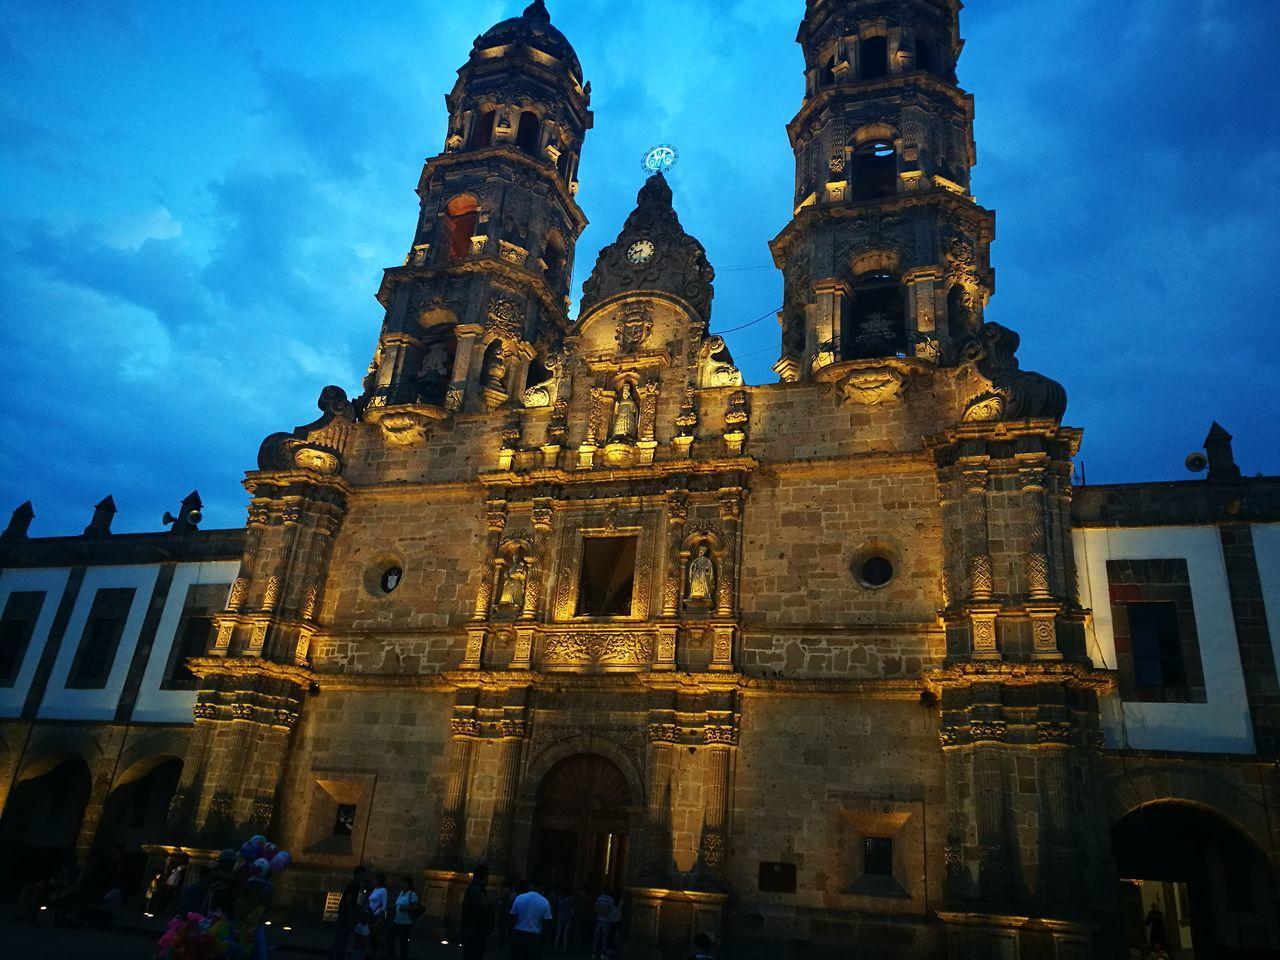 Basilica de Zapopan Jalisco Religion Architecture History Recuerdos♥ Illuminated Architecture